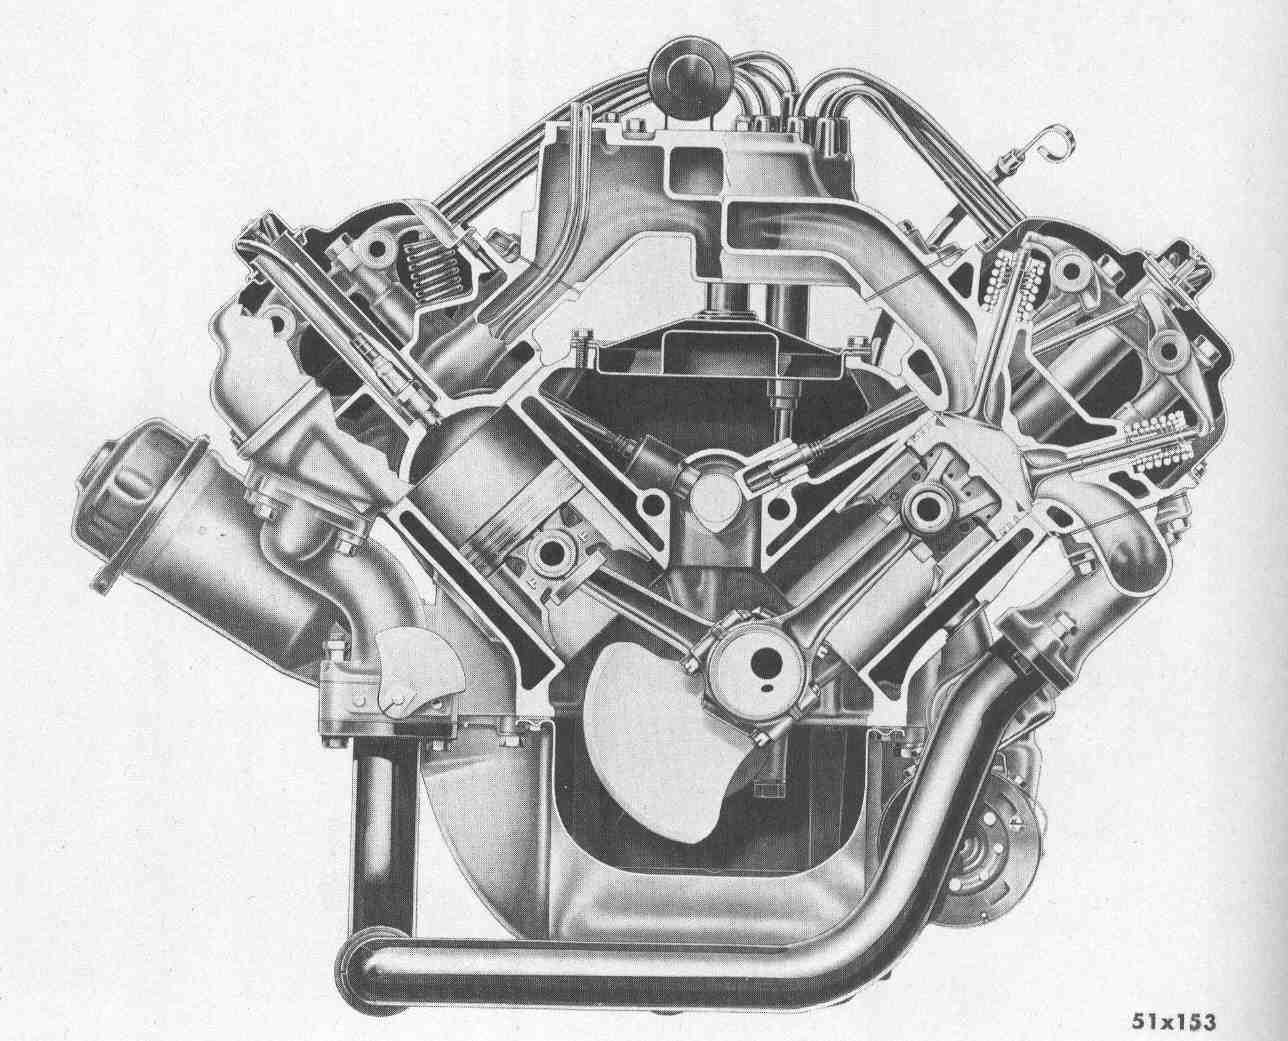 1950s 'double rocker' hemi | mopar syle | mopar | chrysler ... regular vs hemi engine diagram